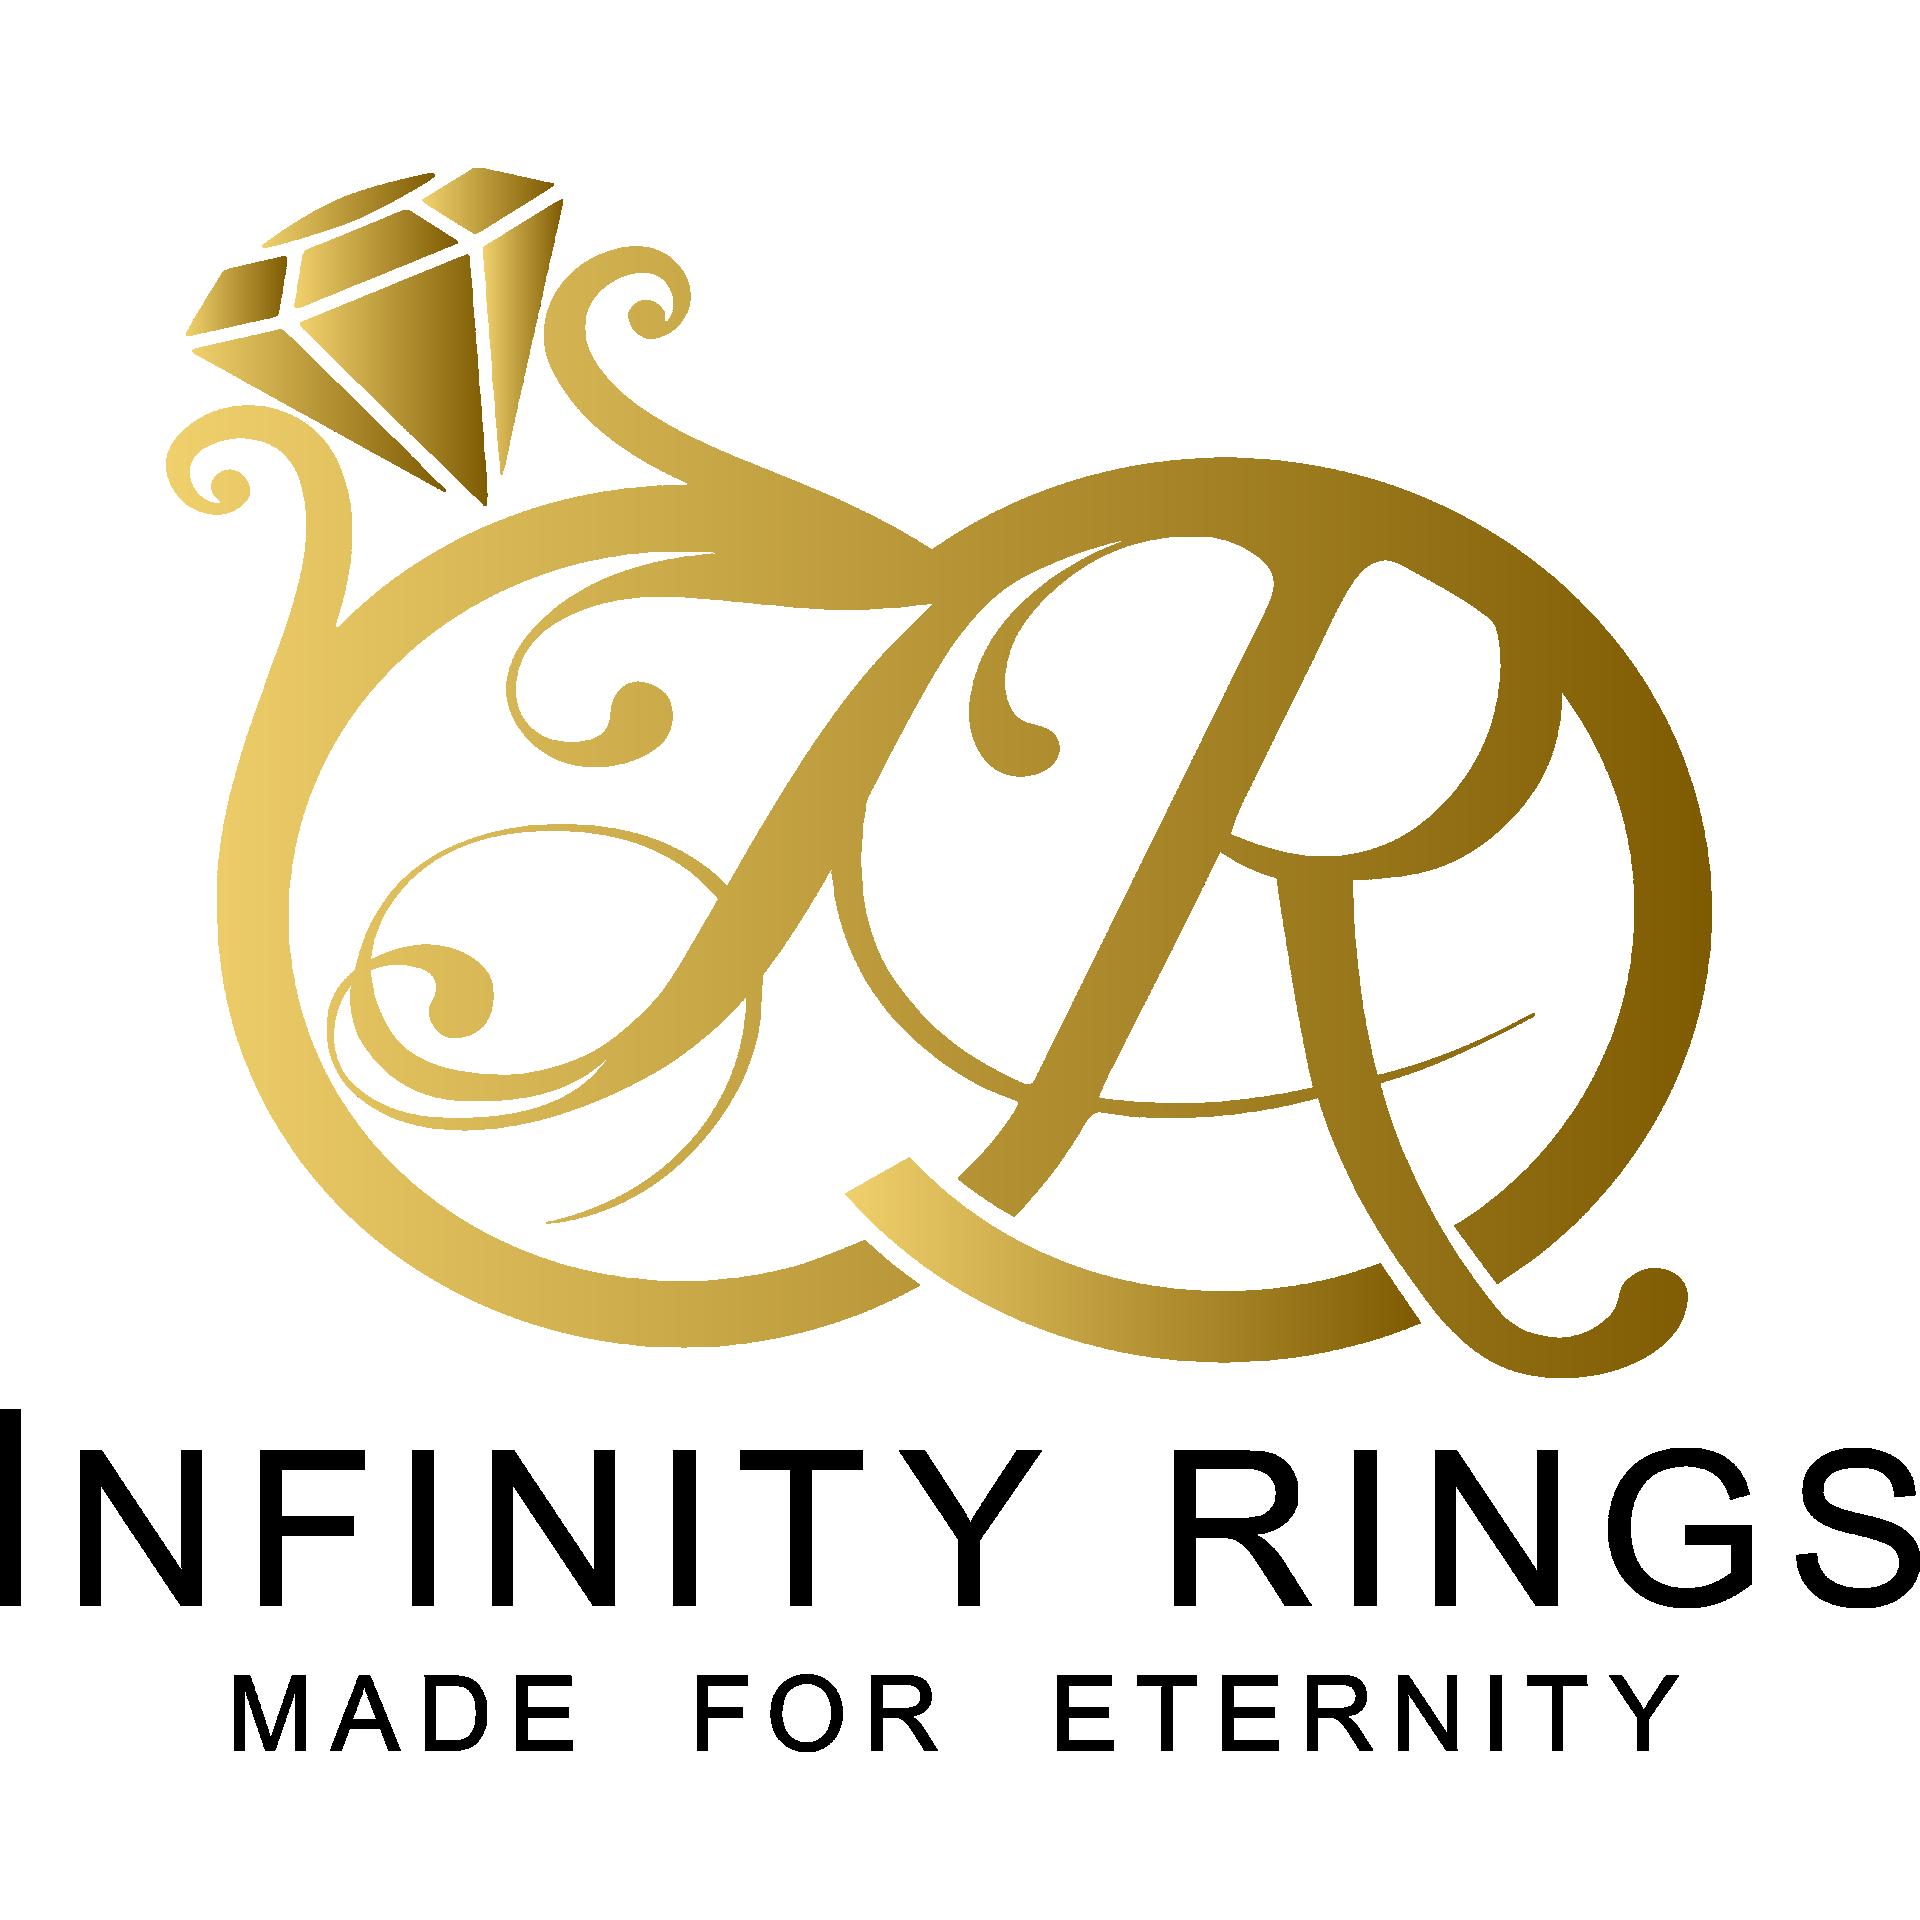 Filigraner Wickel-Ring silber mit überkreuzten Ringschienen